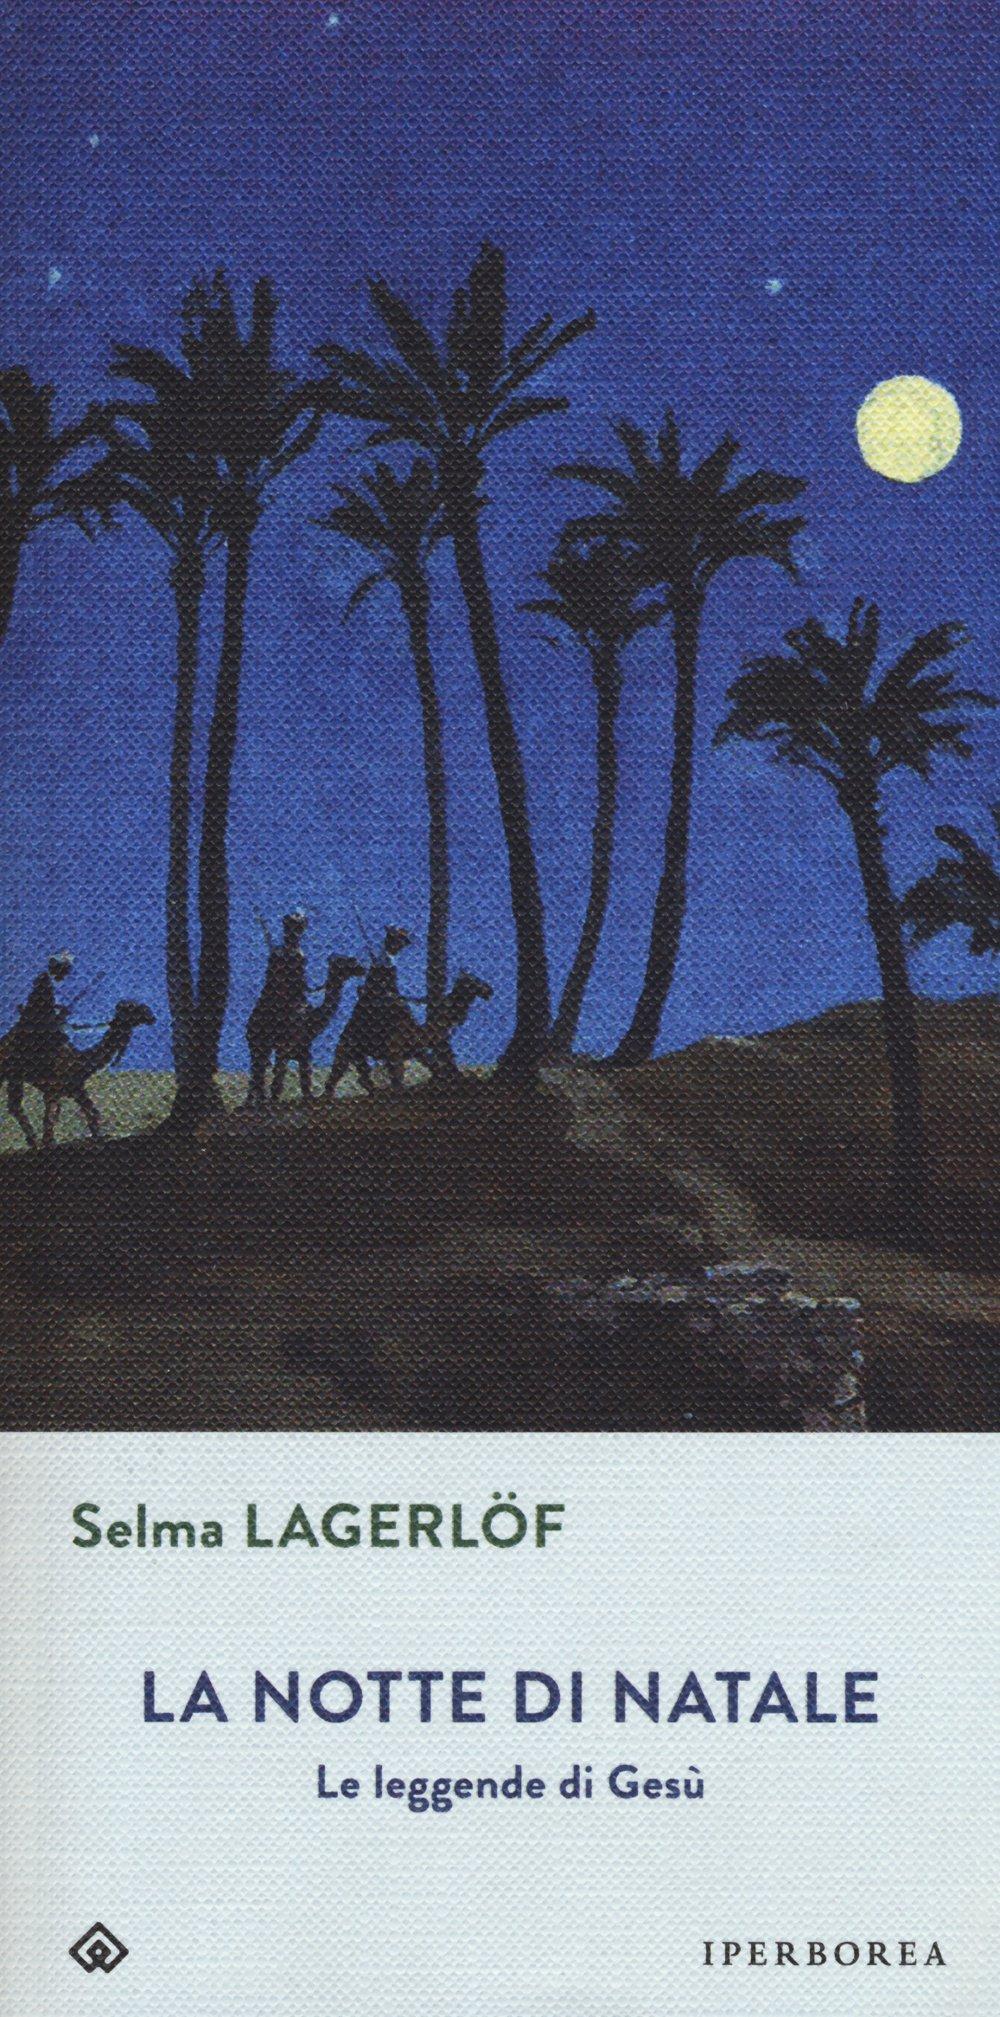 La notte di Natale. Le leggende di Gesù Copertina flessibile – 12 nov 2015 Selma Lagerlöf M. Svendsen Bianchi Iperborea 8870914569